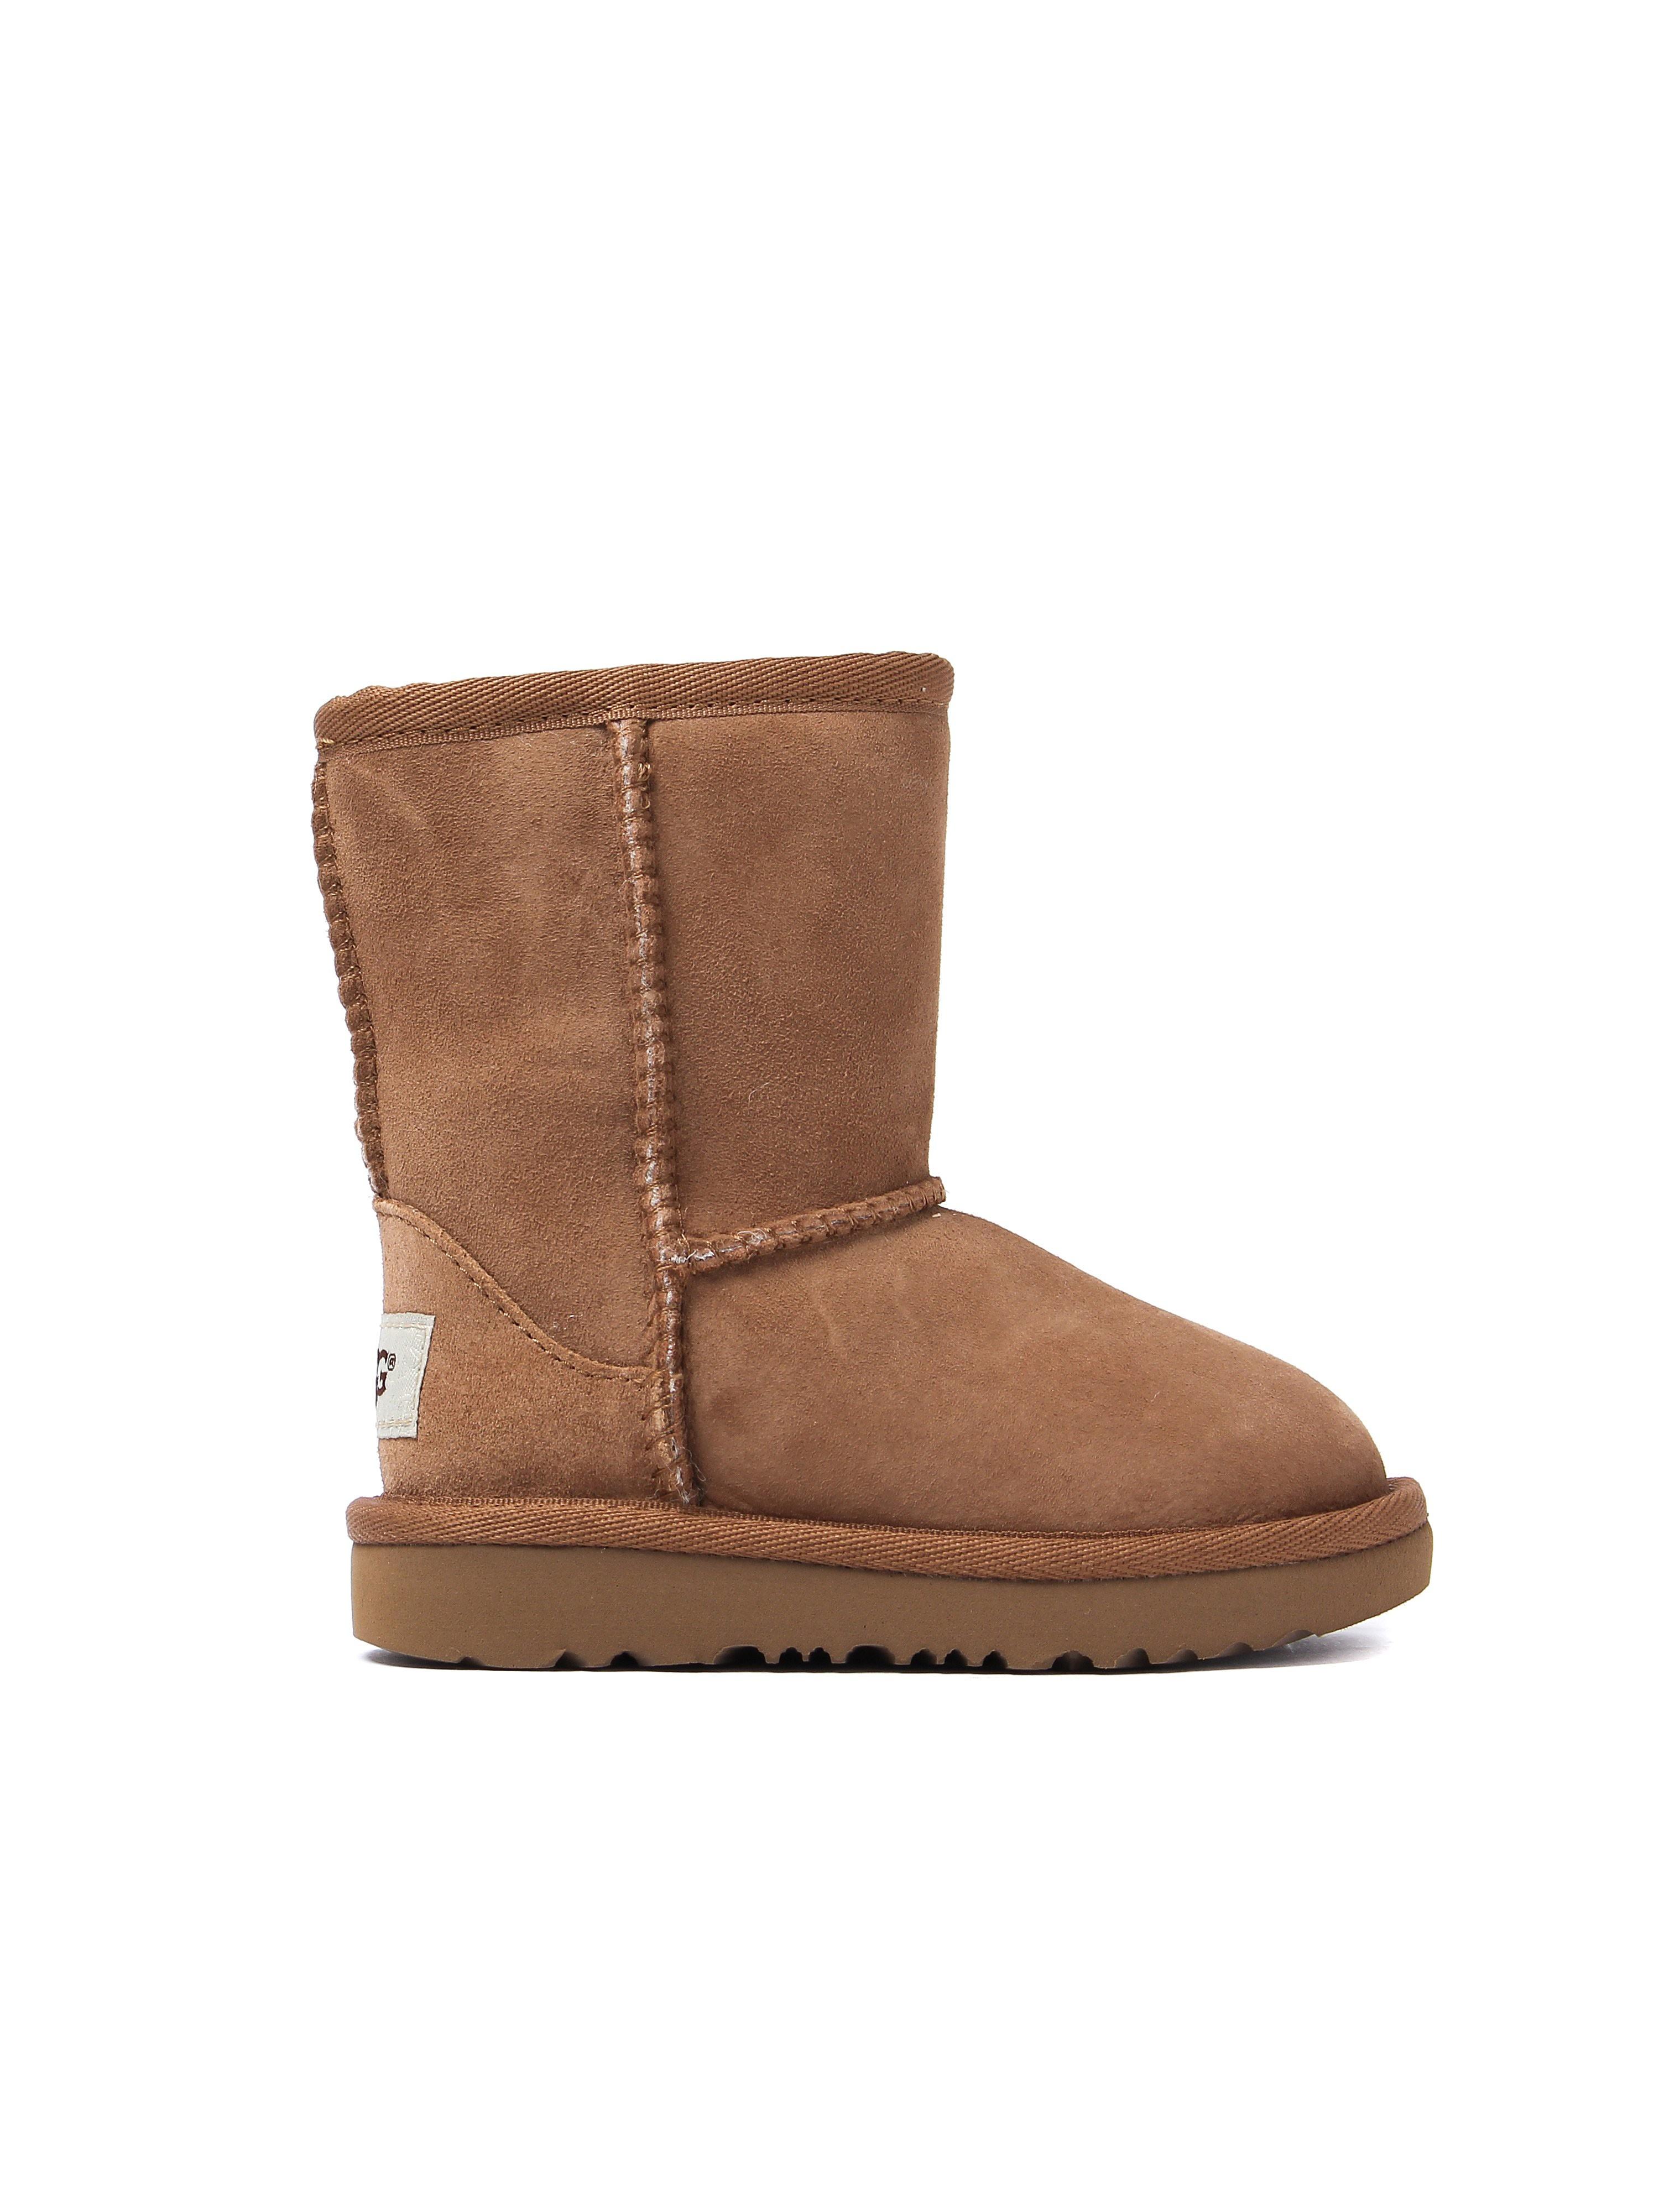 UGG Infant Classic Short II Sheepskin Boots - Chestnut